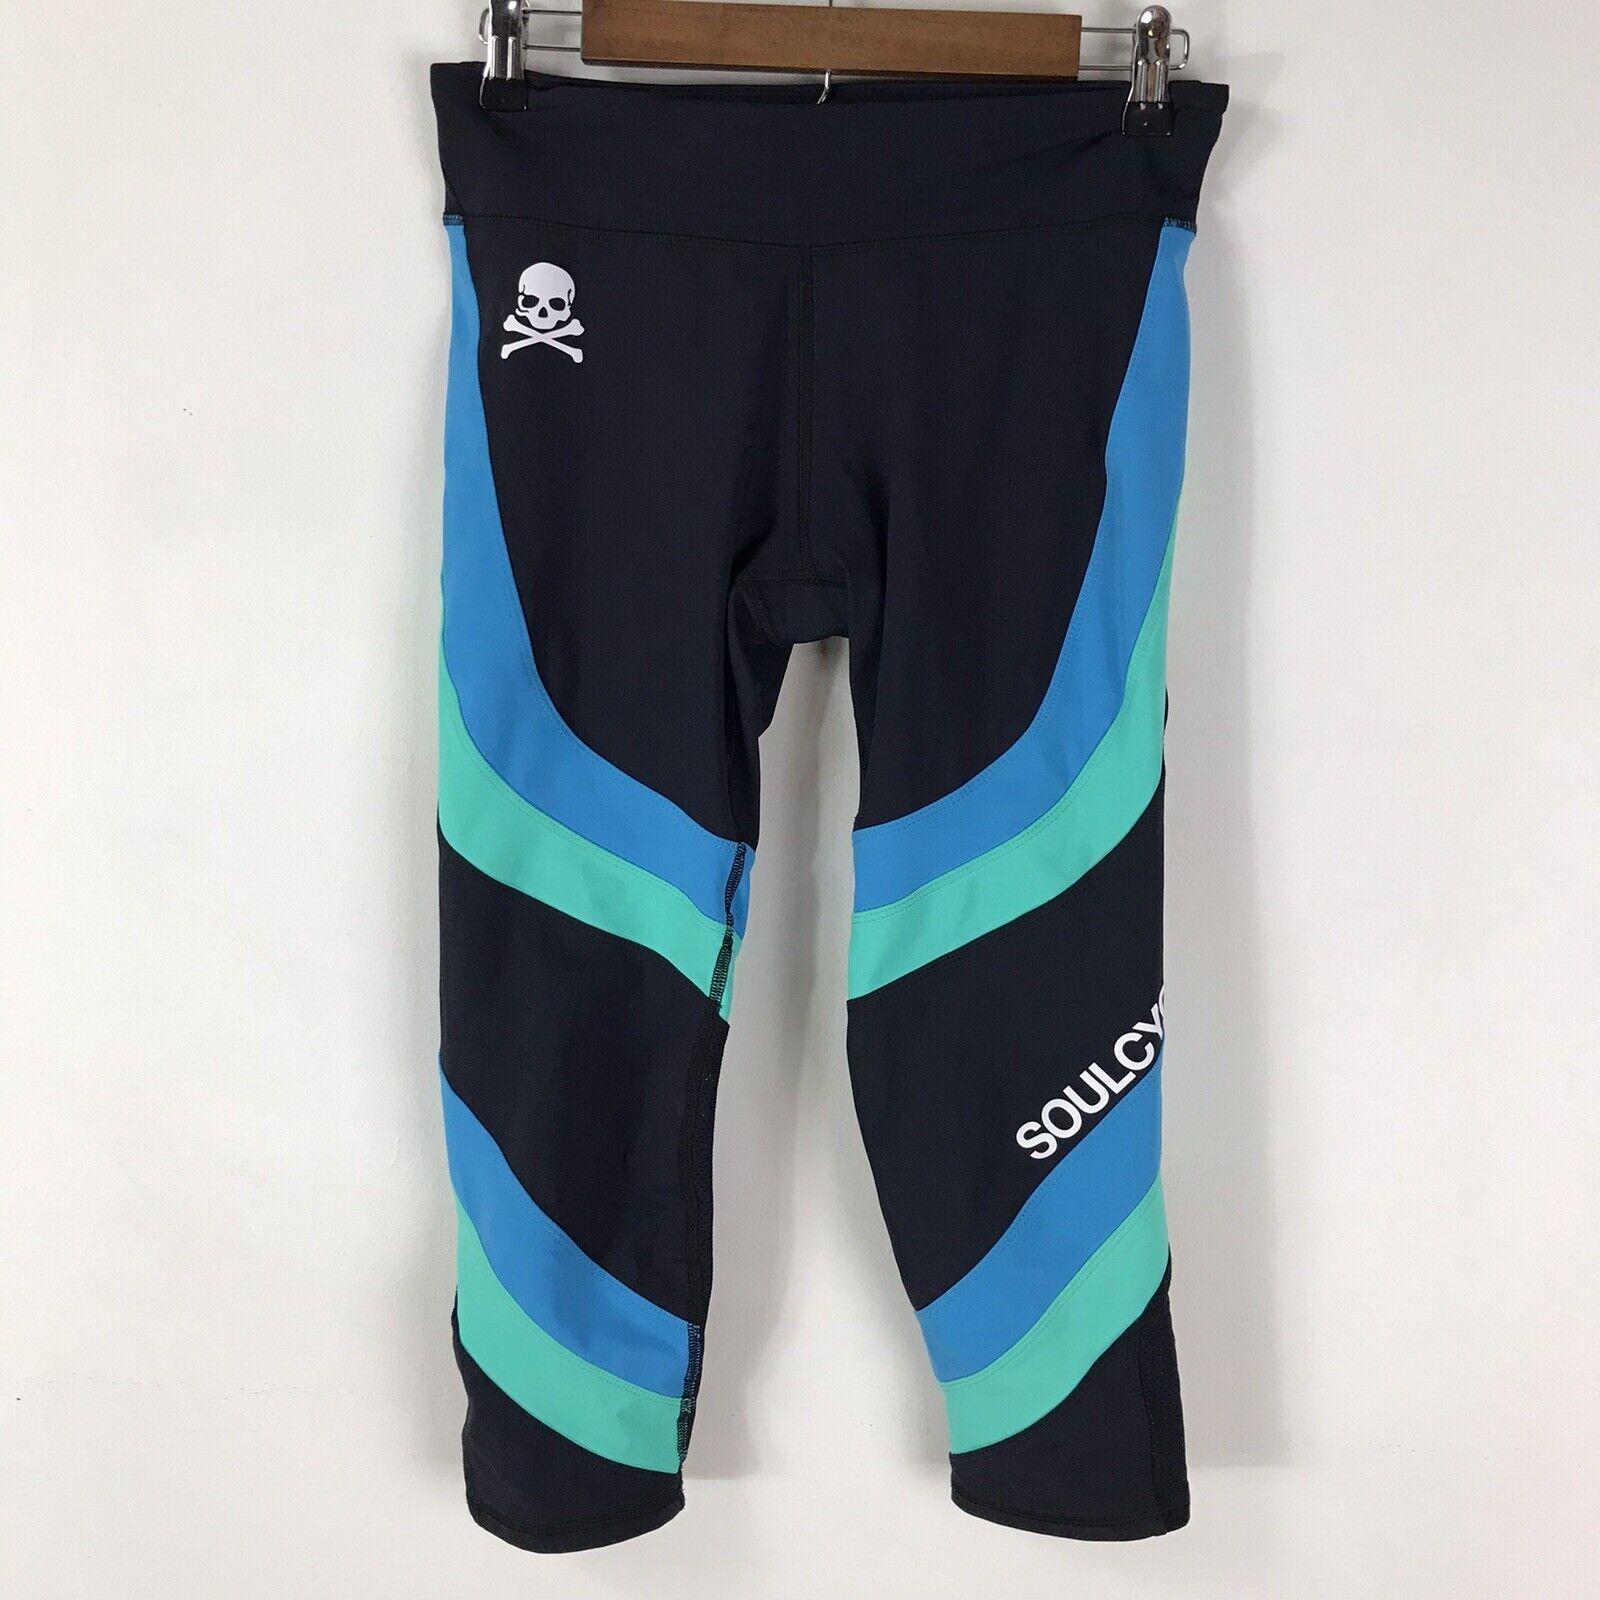 Soulcycle Black Crop Wraparound Blue Green Stripe Workout Legging Size Medium